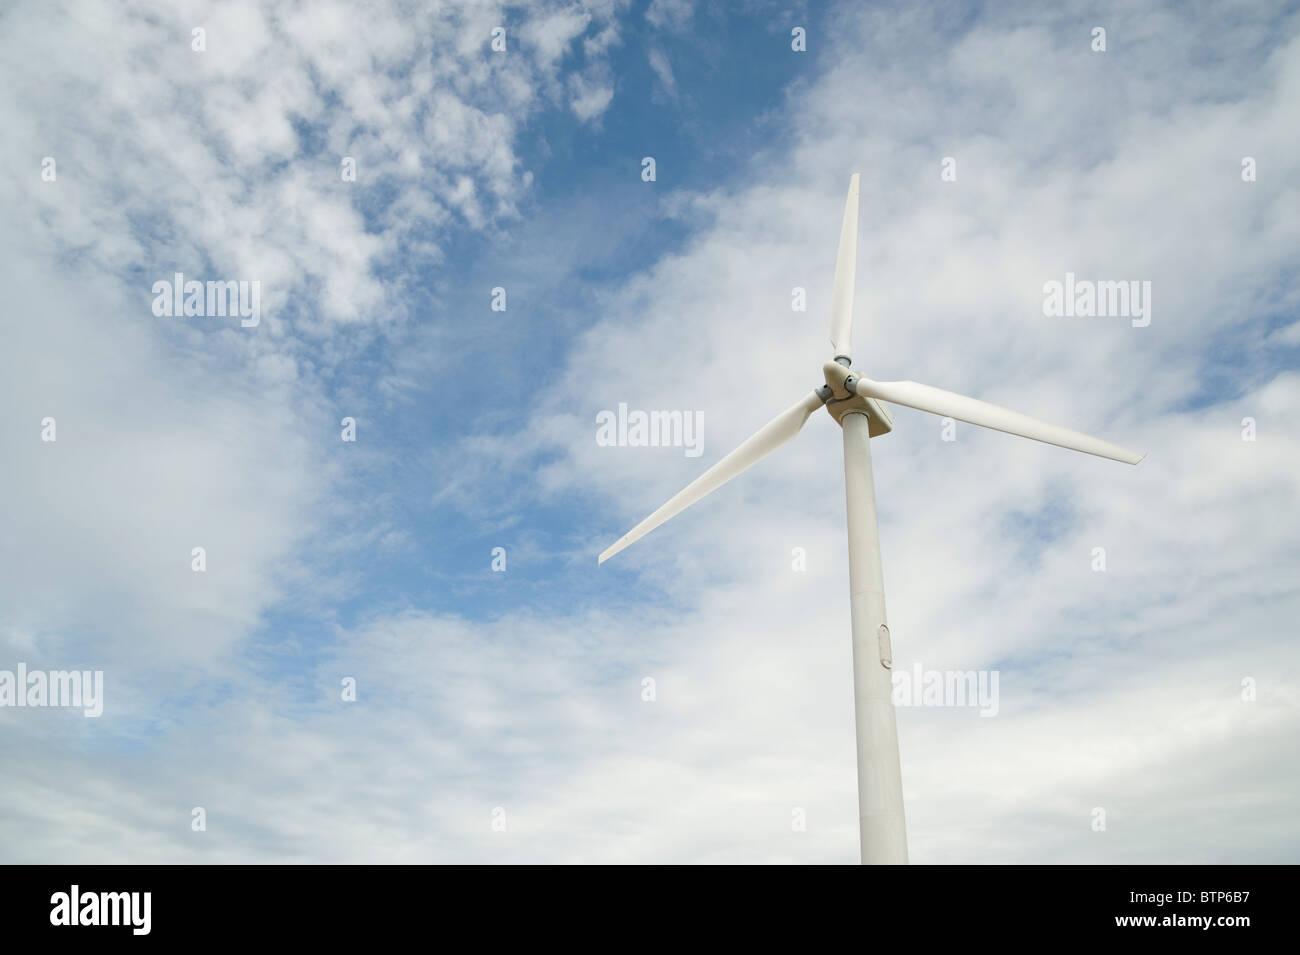 Wind Turbine, Cornwall, UK. - Stock Image